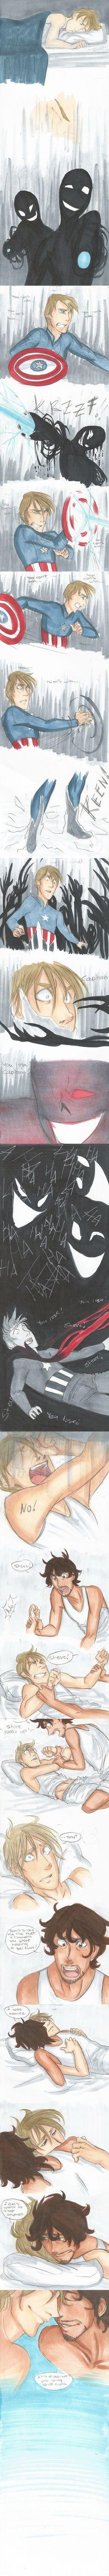 Nightmares by jack-o-lantern12.deviantart.com on @deviantART